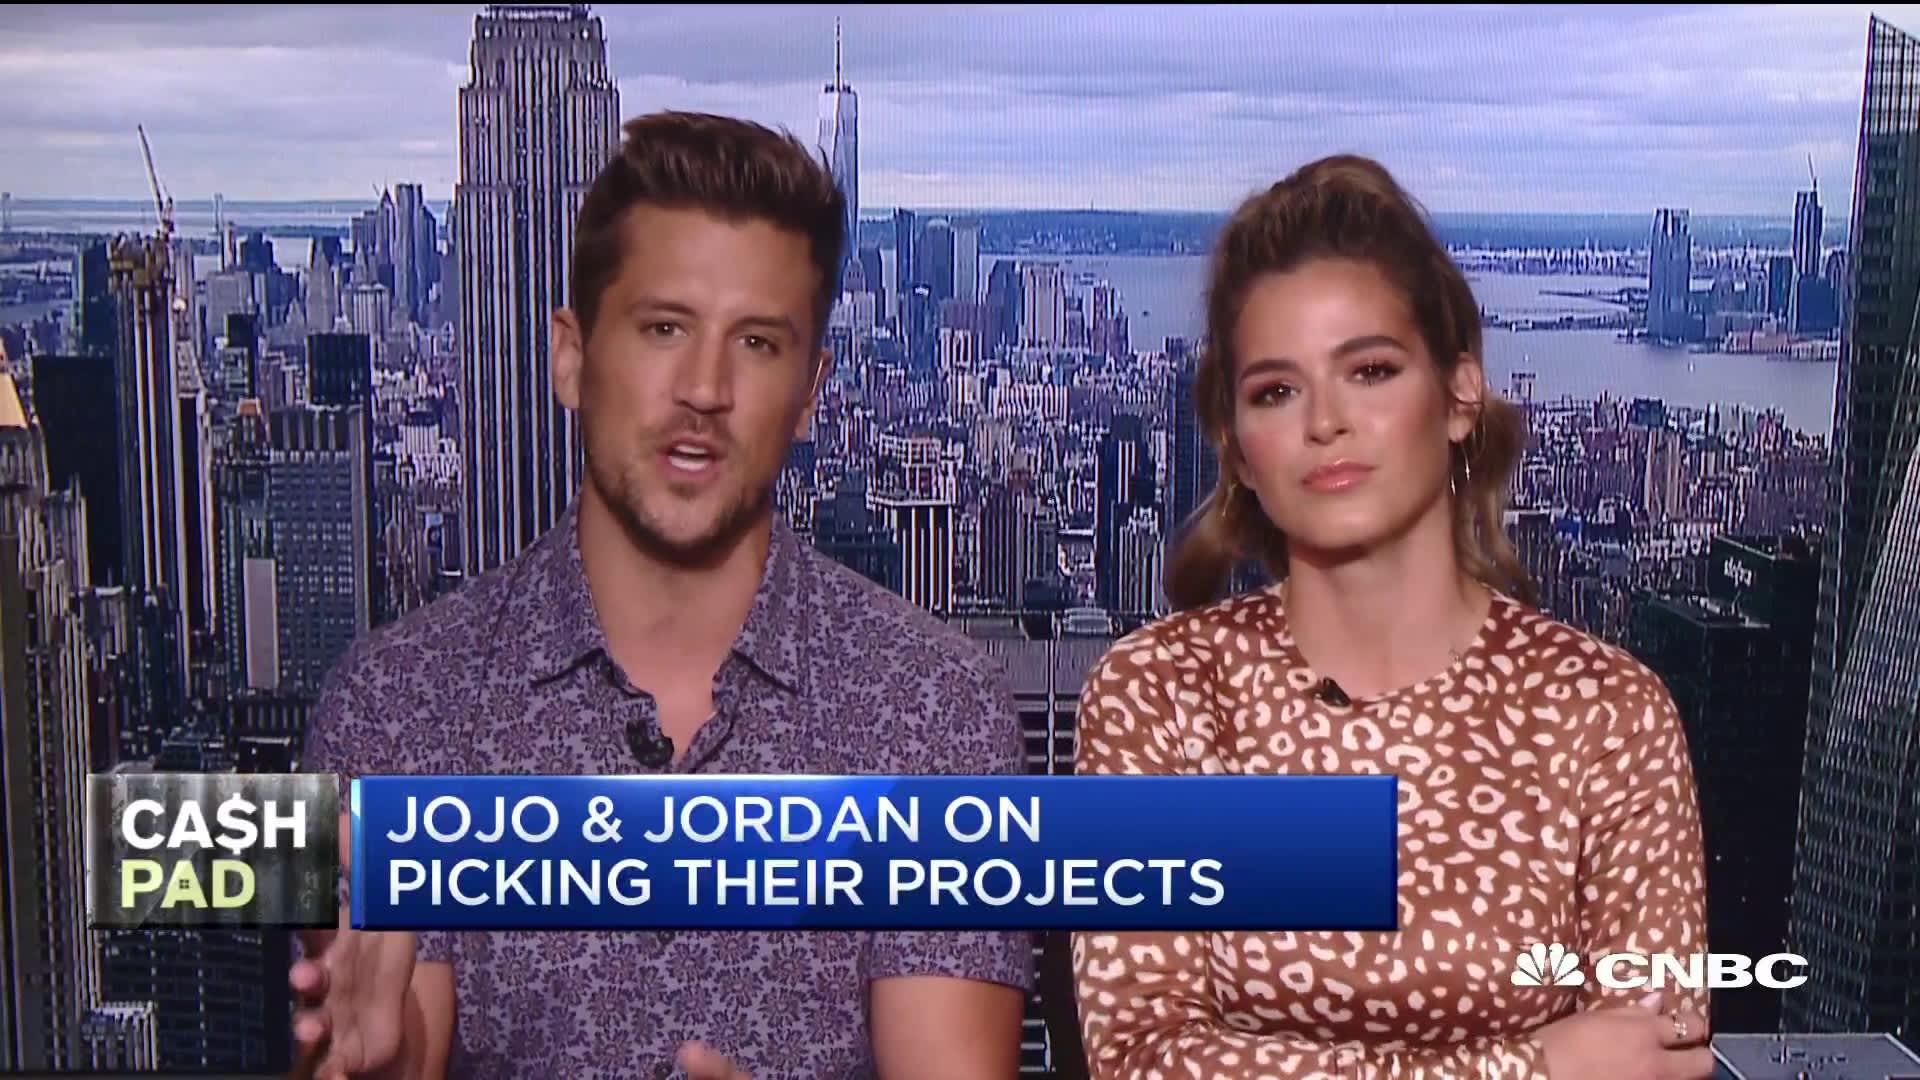 Former 'The Bachelorette' contestants JoJo Fletcher and Jordan Rodgers  discuss their new show 'Cash Pad'